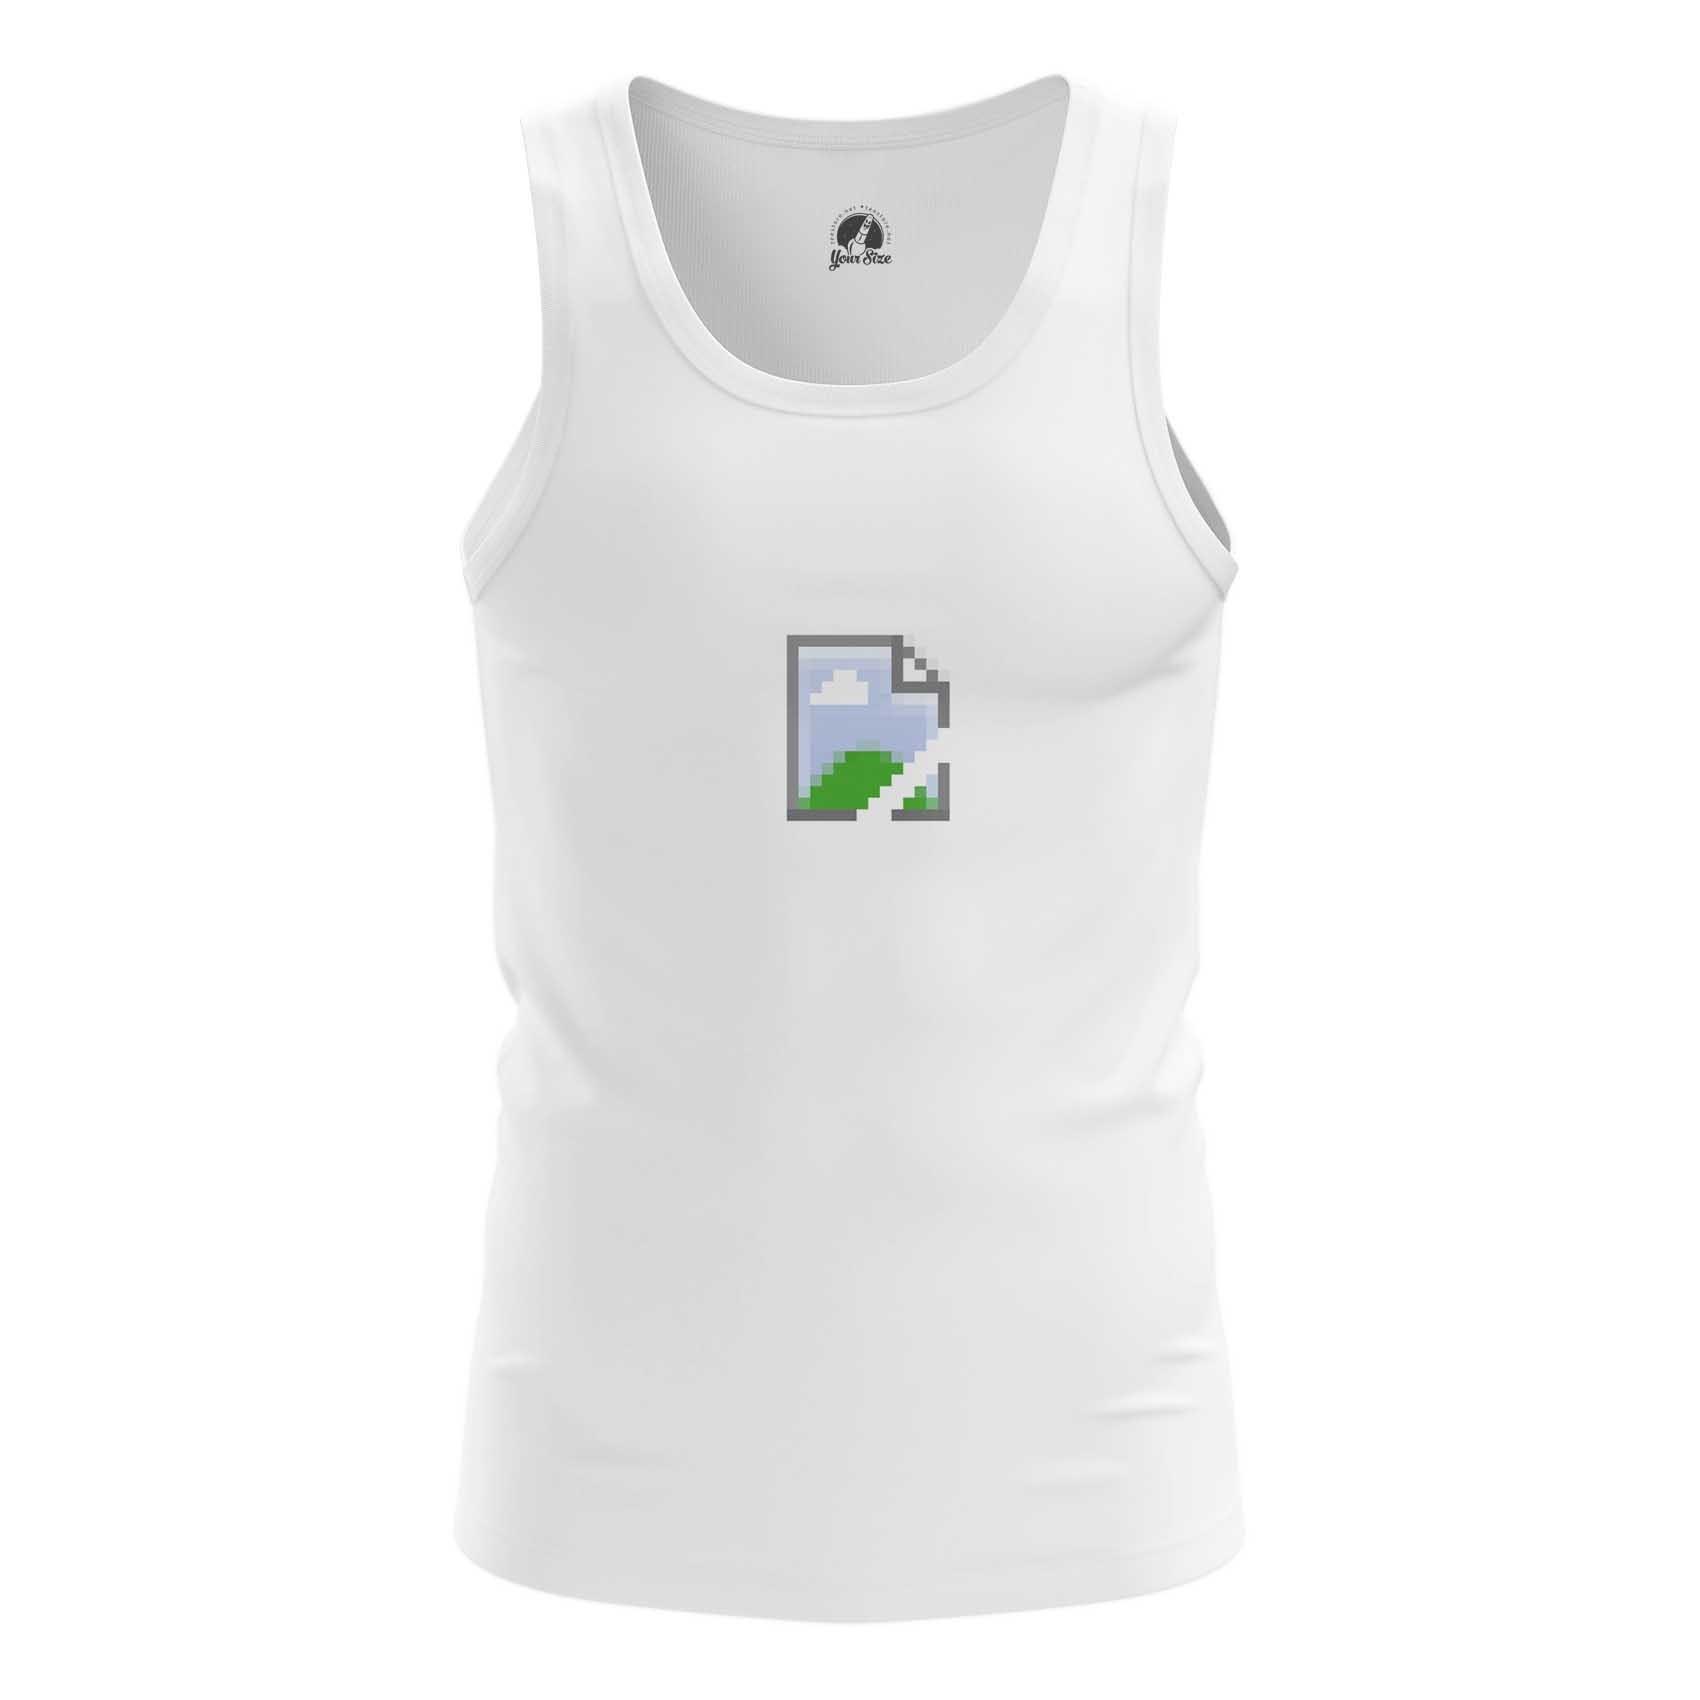 Collectibles Men'S T-Shirt Pic Icon No Image Web Art Fun